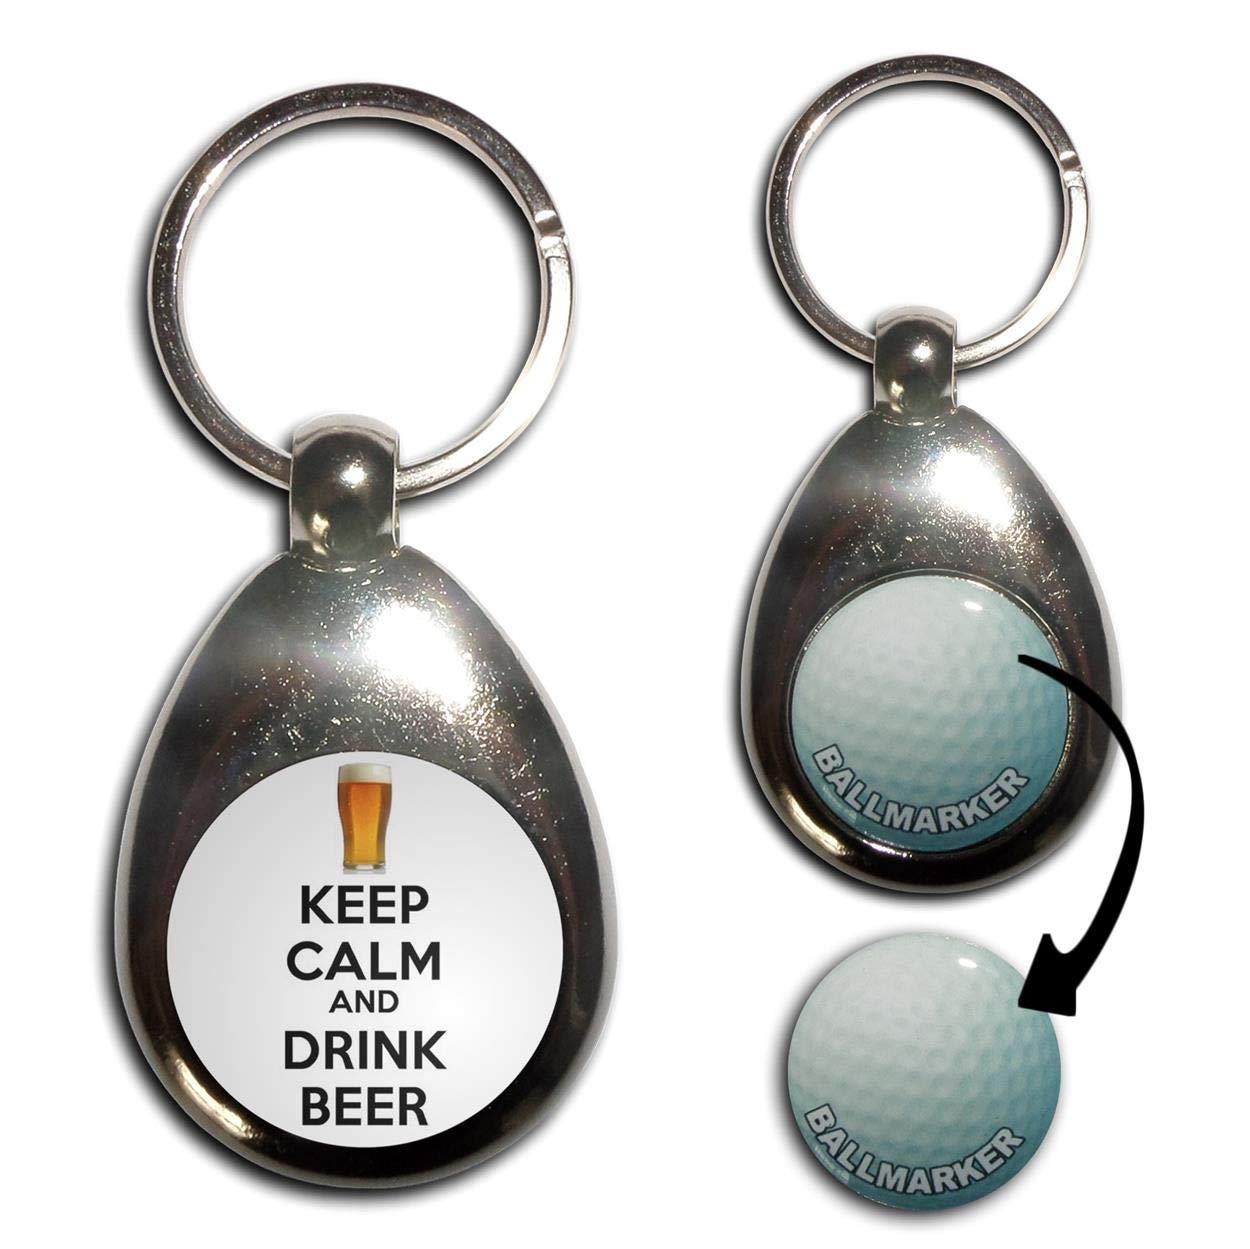 Keep Calm and and Drink Beer – ゴルフボールマーカーキーリング B00JCEZRPS Drink B00JCEZRPS, 本坊酒造 公式通販【】:6c474ced --- awardsame.club